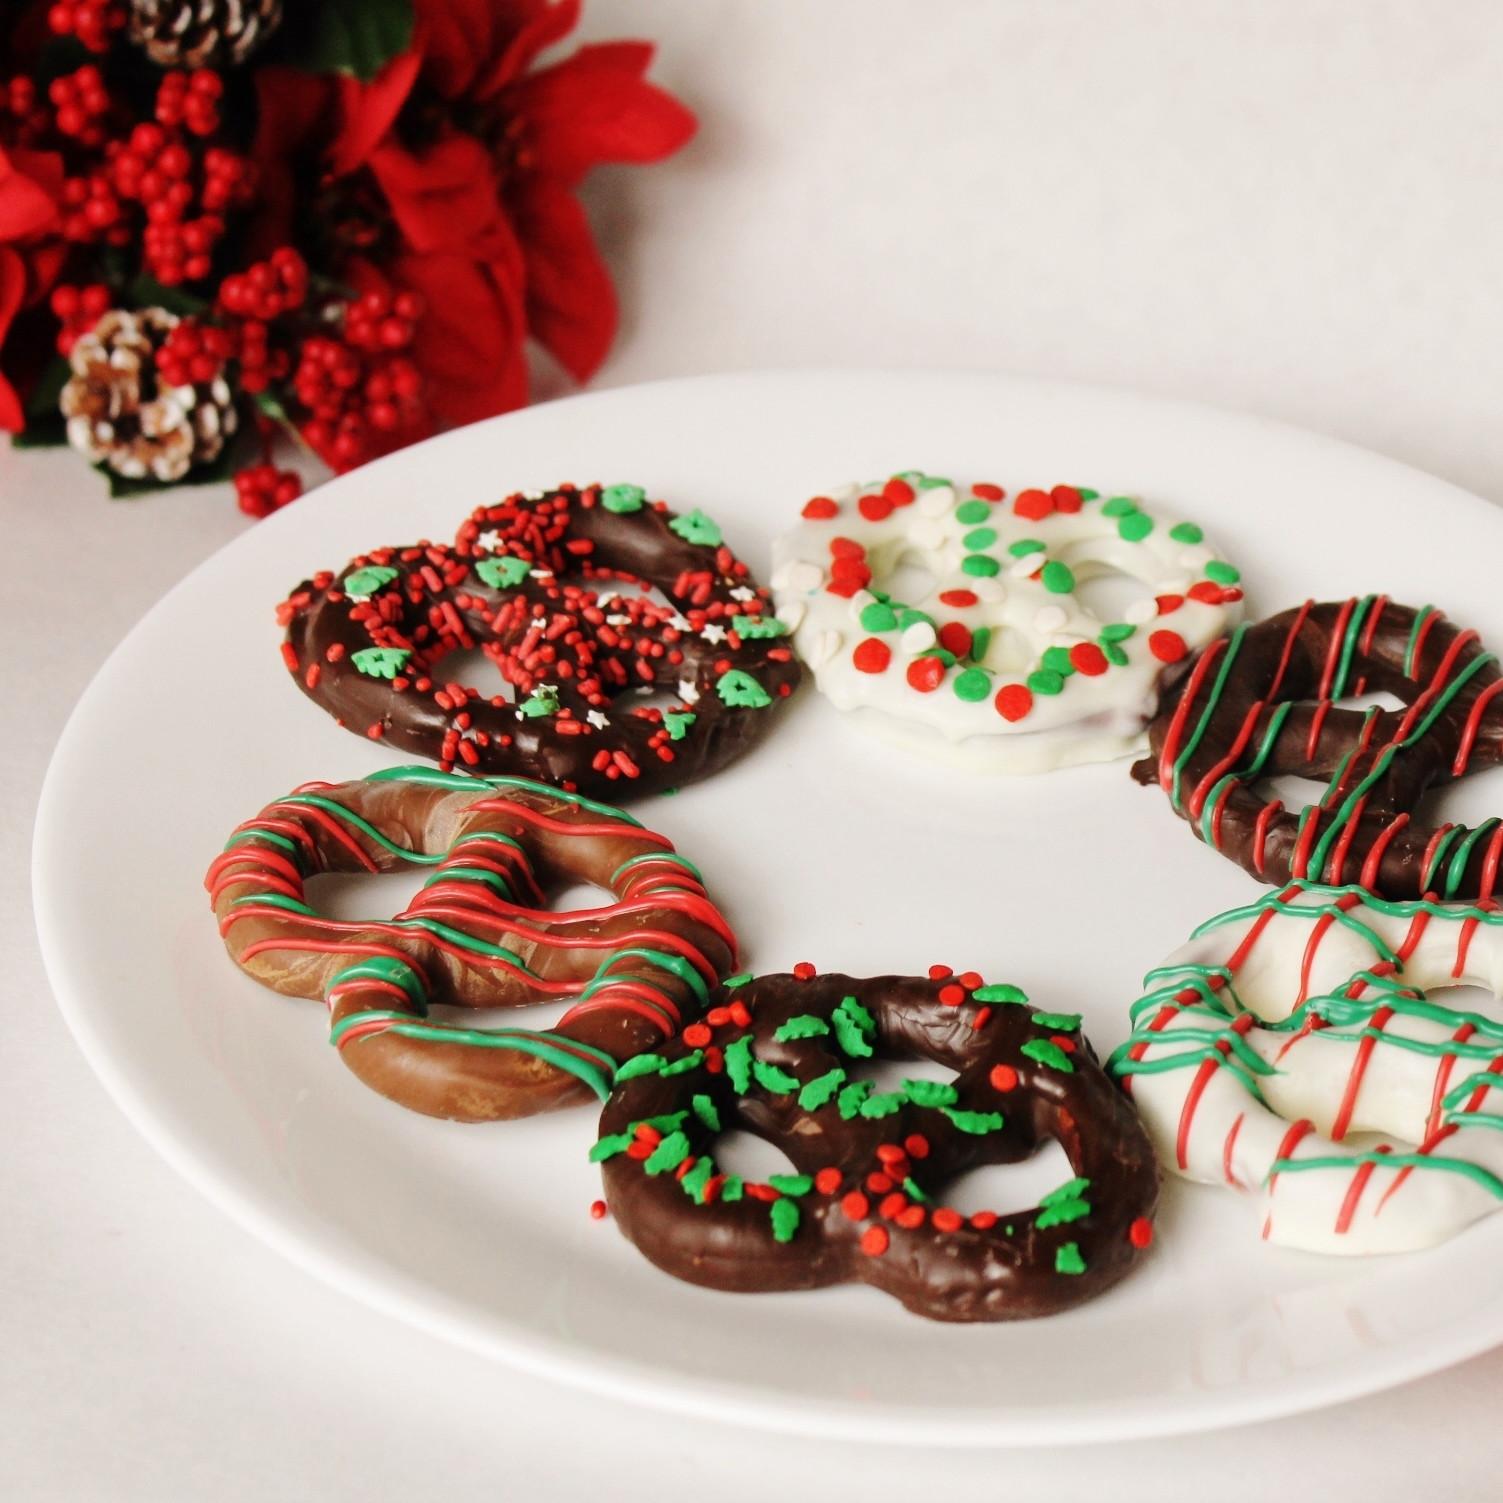 Christmas Chocolate Dipped Pretzels  Christmas Chocolate Covered Pretzels Knots